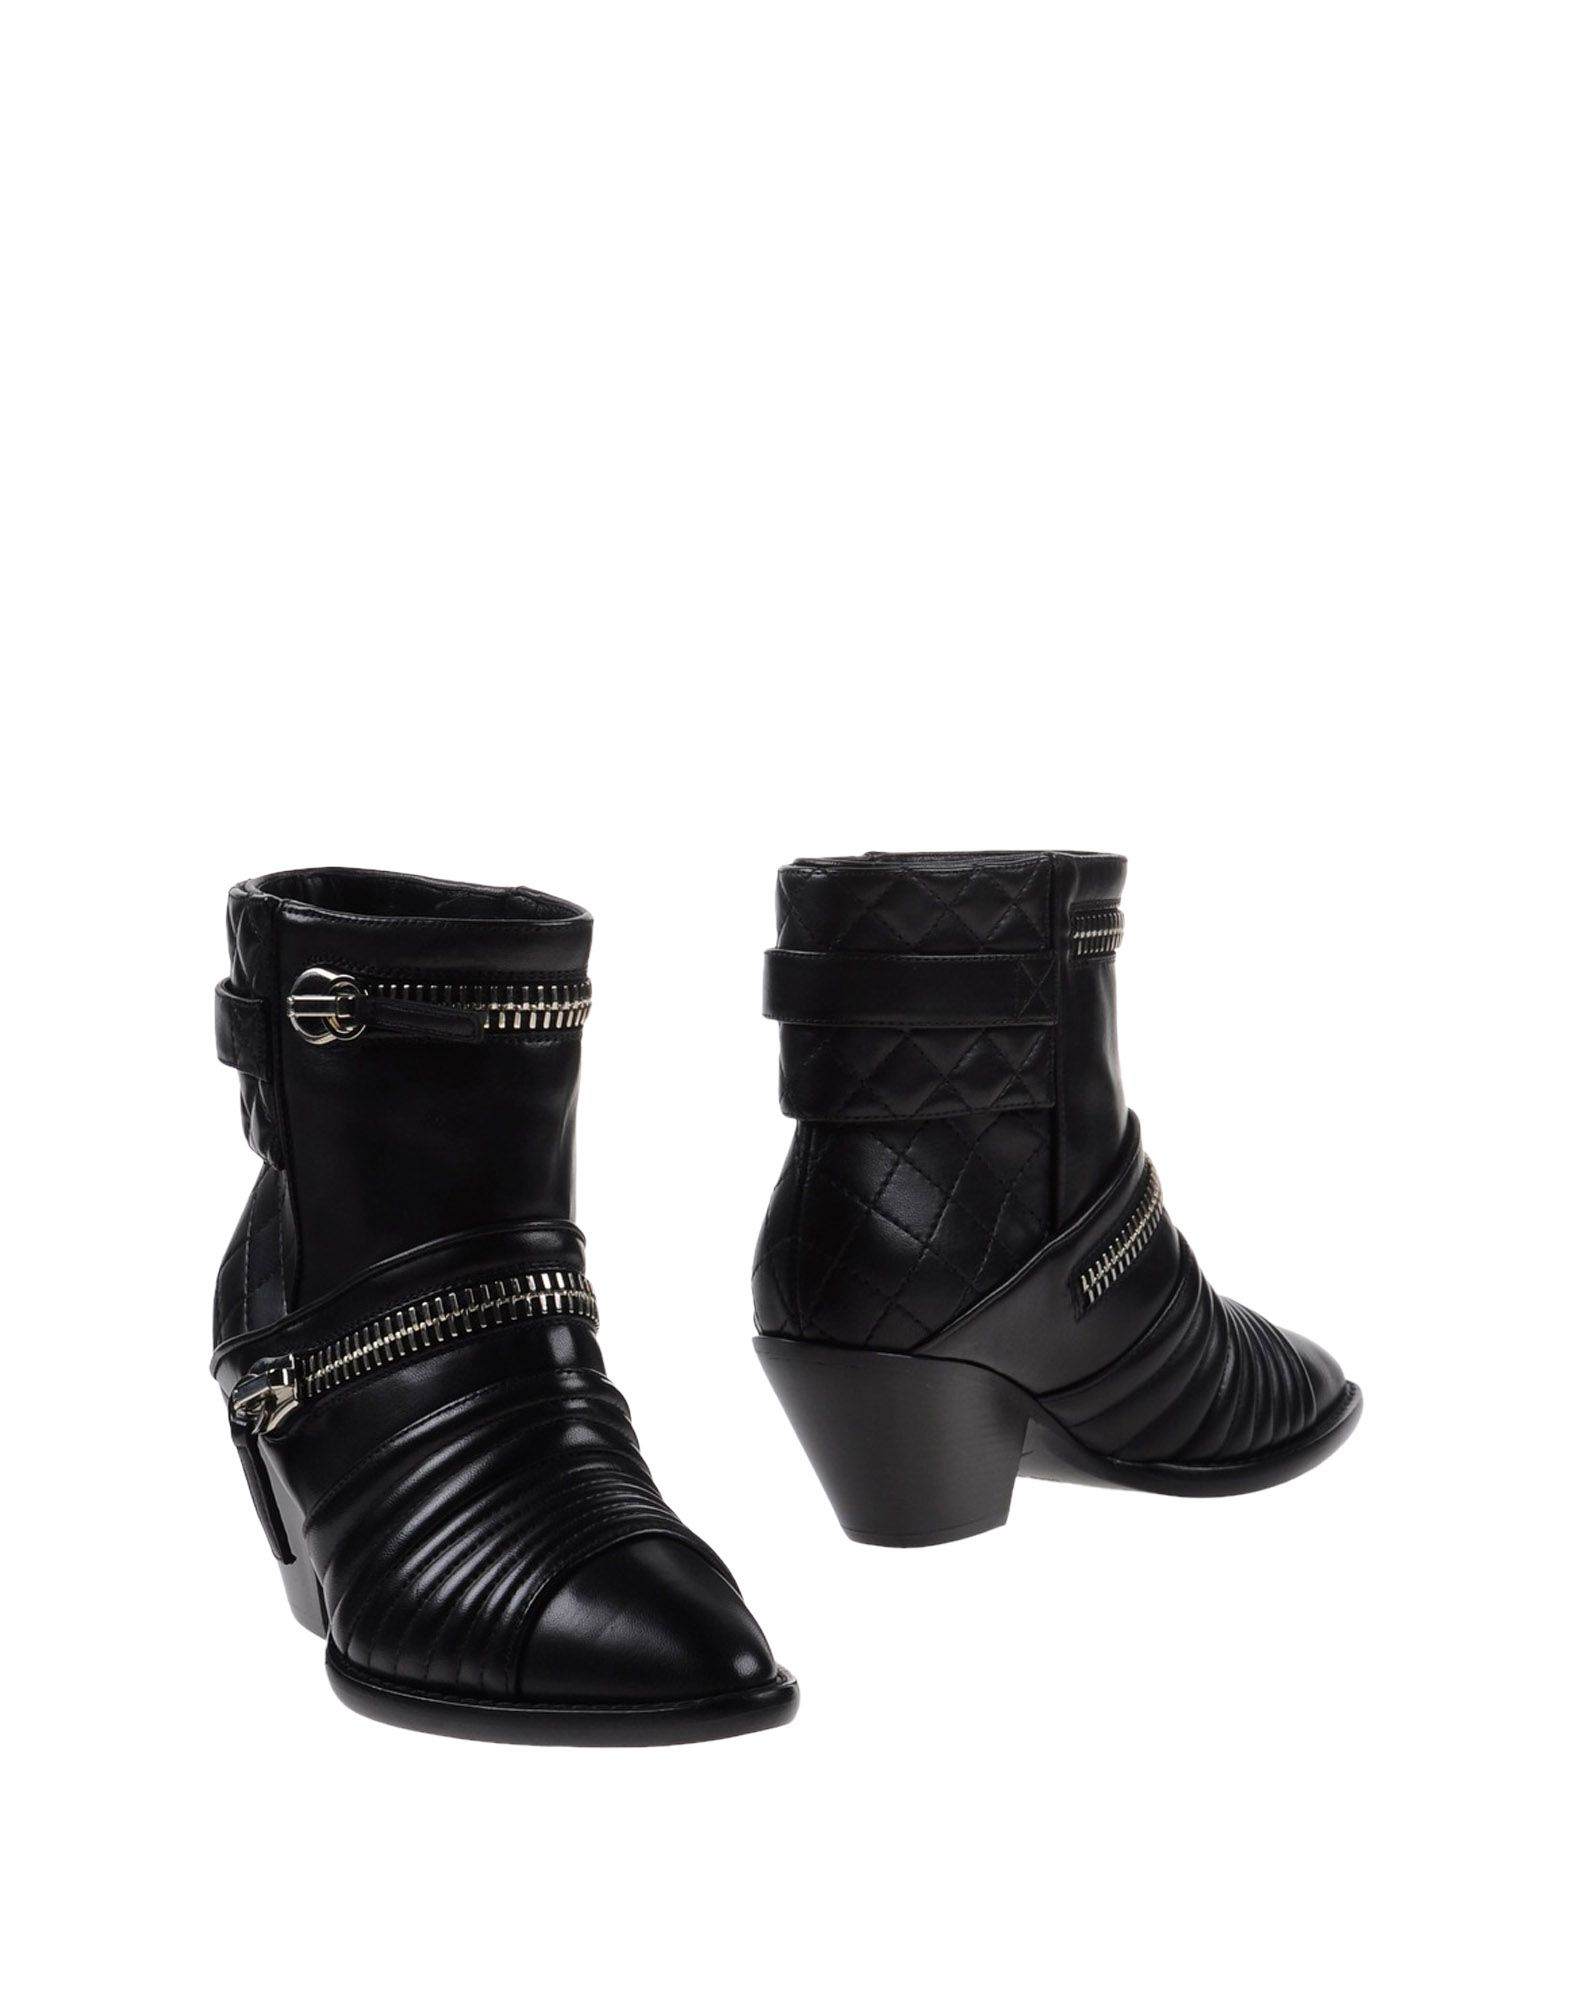 Giuseppe Zanotti Stiefelette Damen Neue  11005095IB Neue Damen Schuhe a0e06f